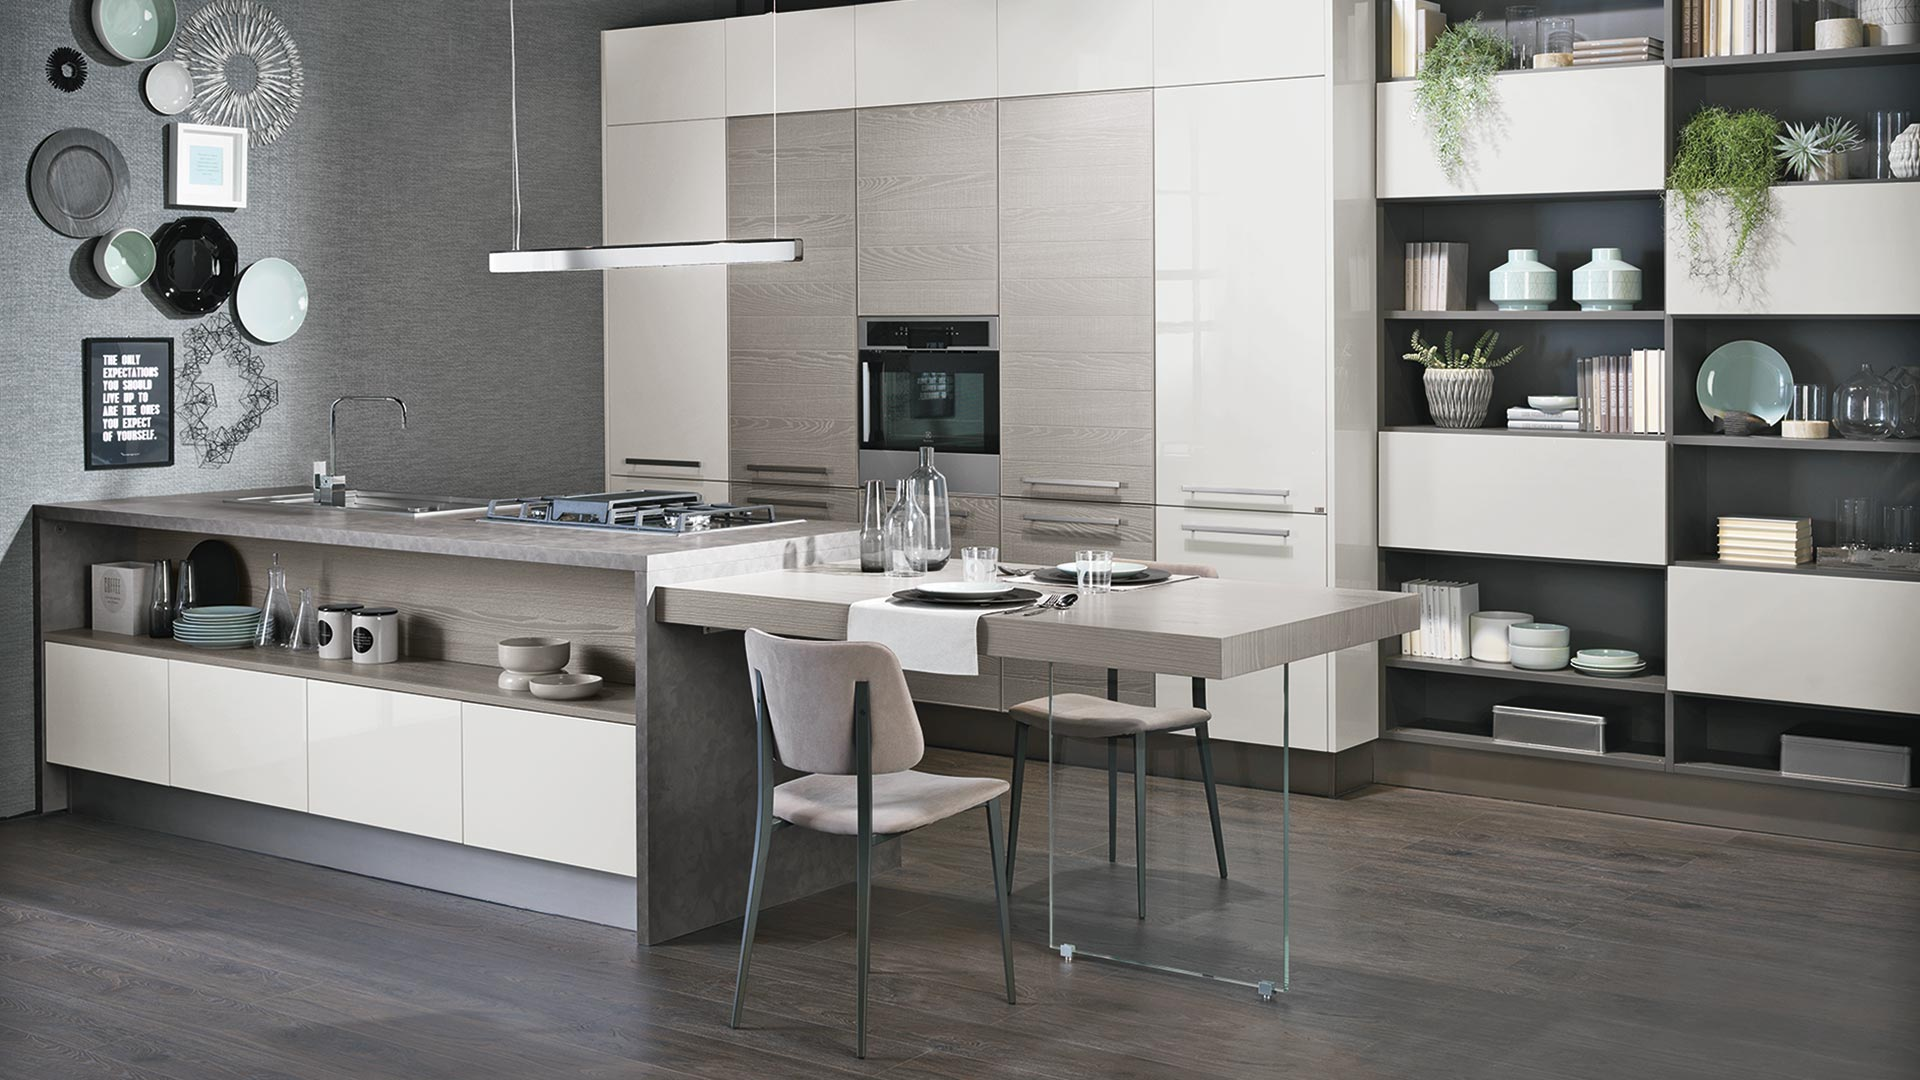 Cucine Moderne Con Isola Lube.Cucine Moderne Arredo Cucina Moderna Cucine Lube